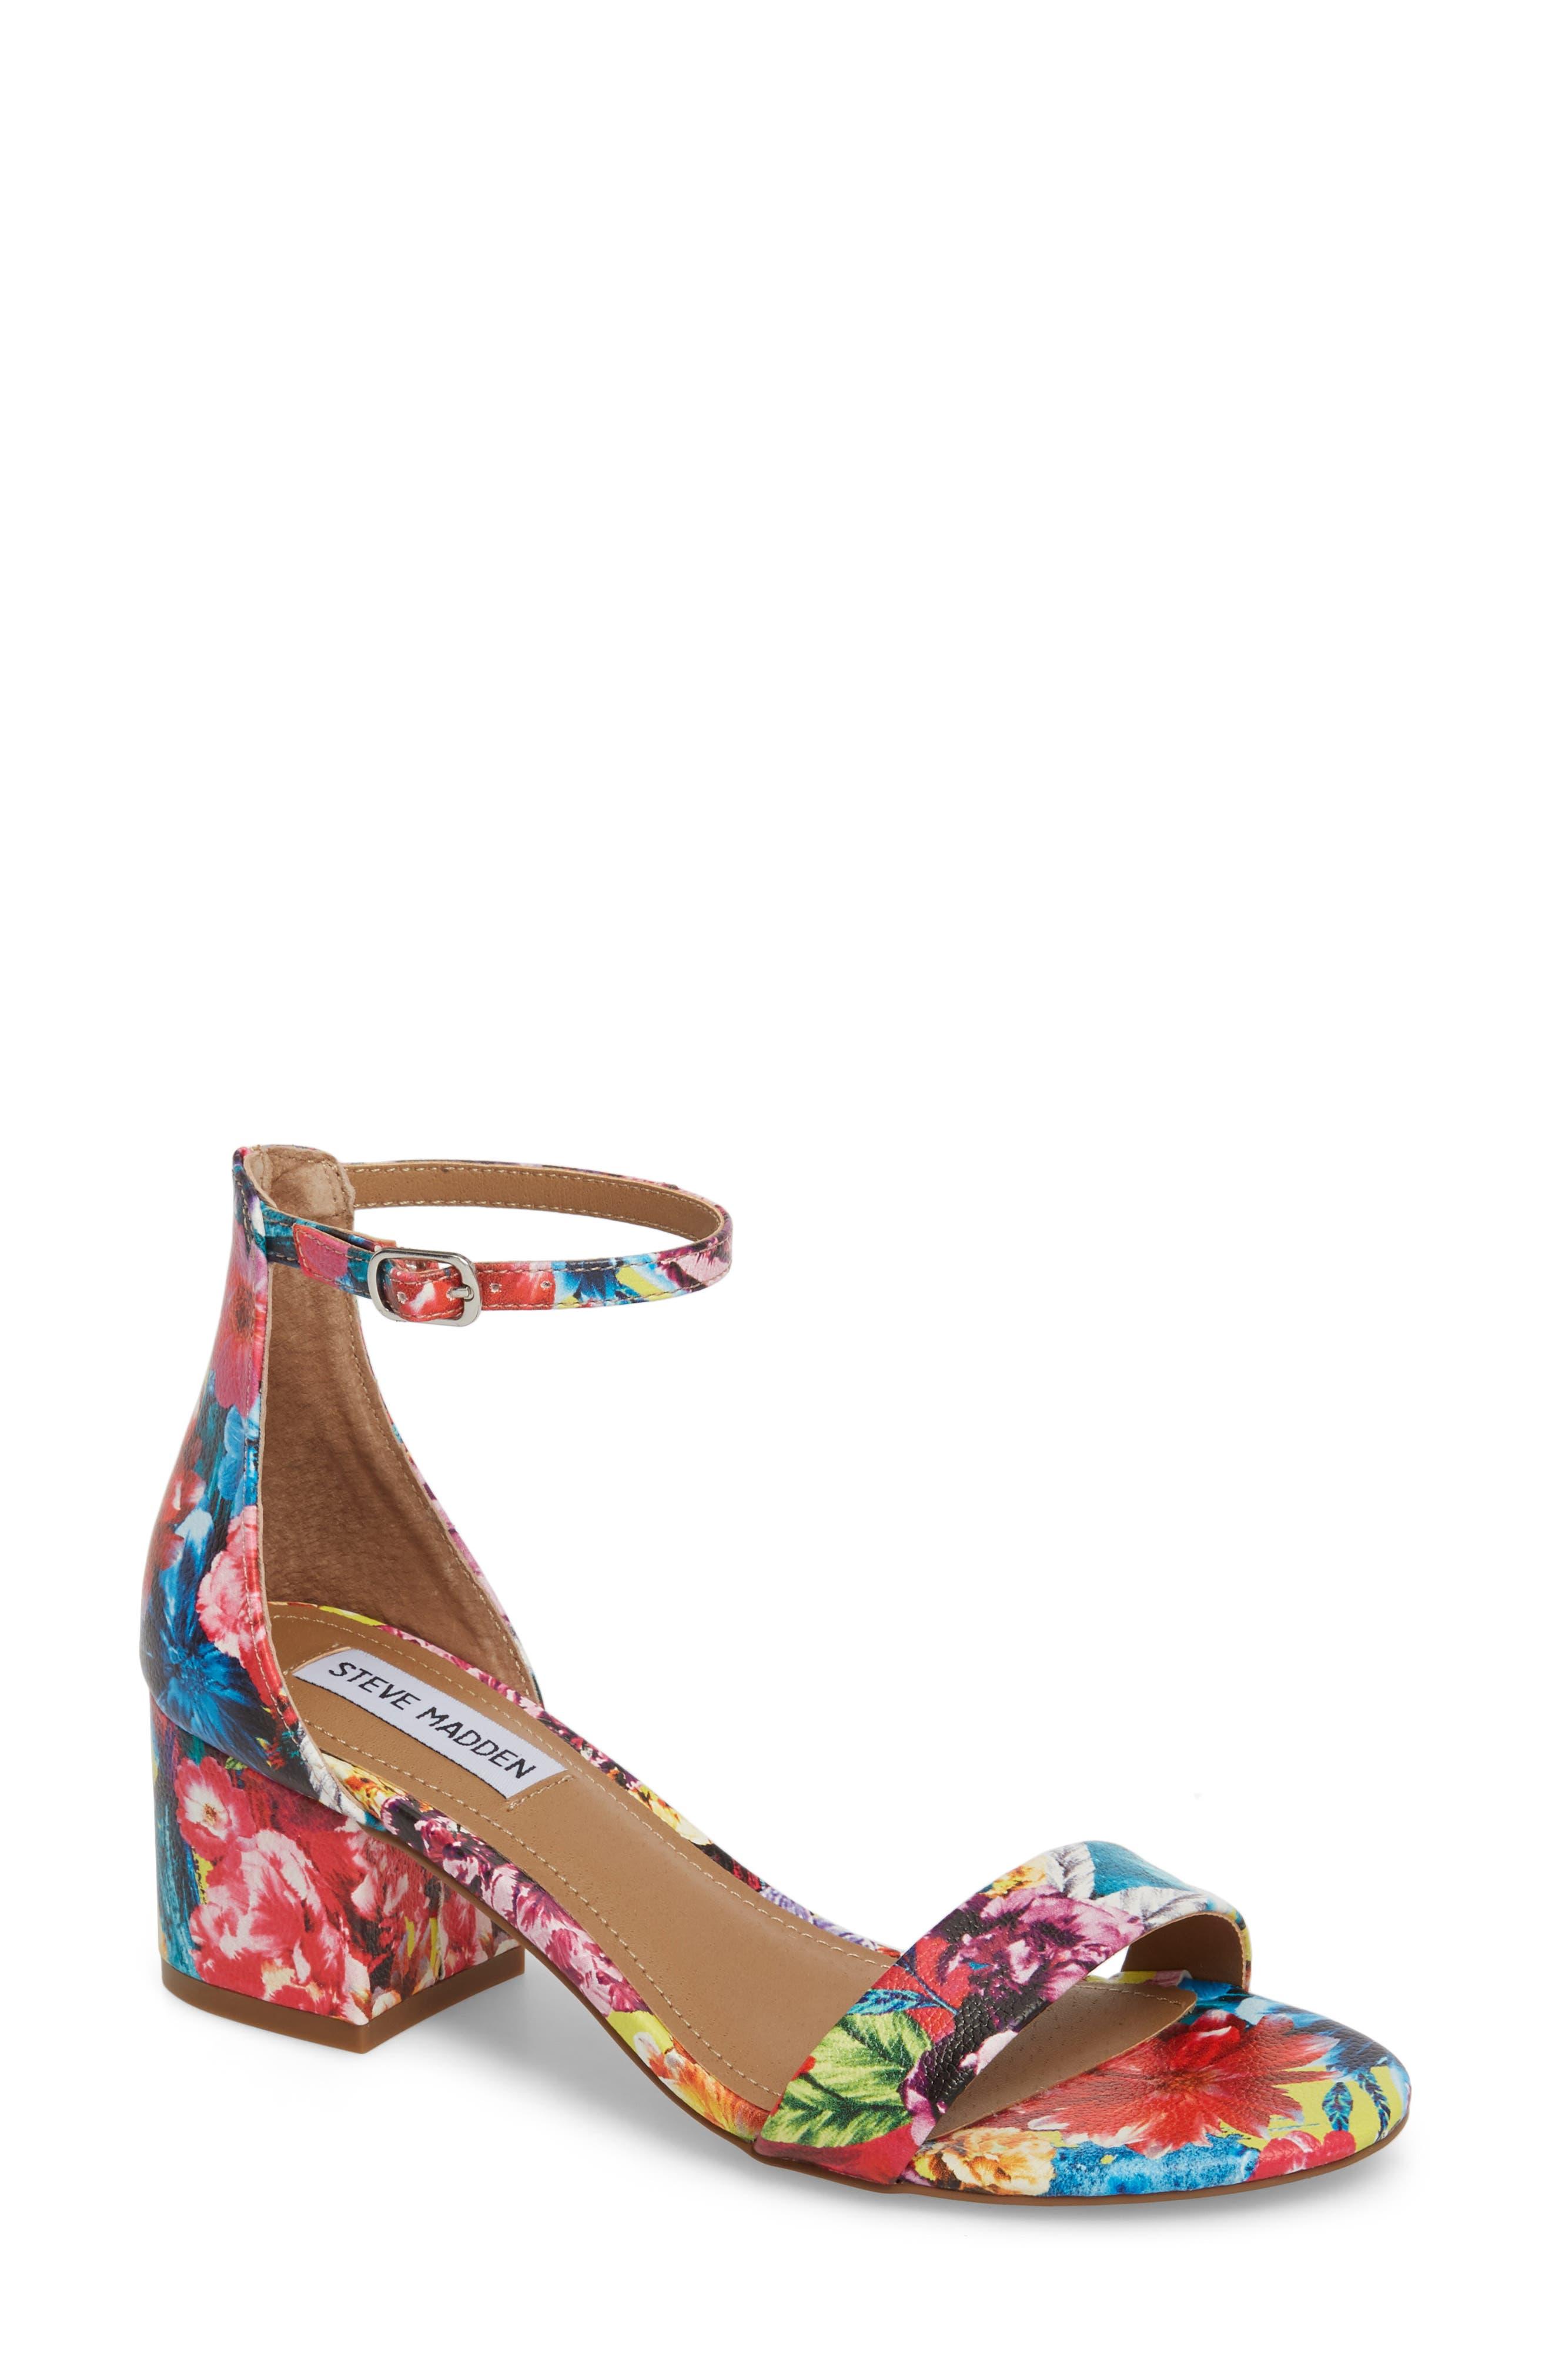 Irenee Ankle Strap Sandal,                             Main thumbnail 12, color,